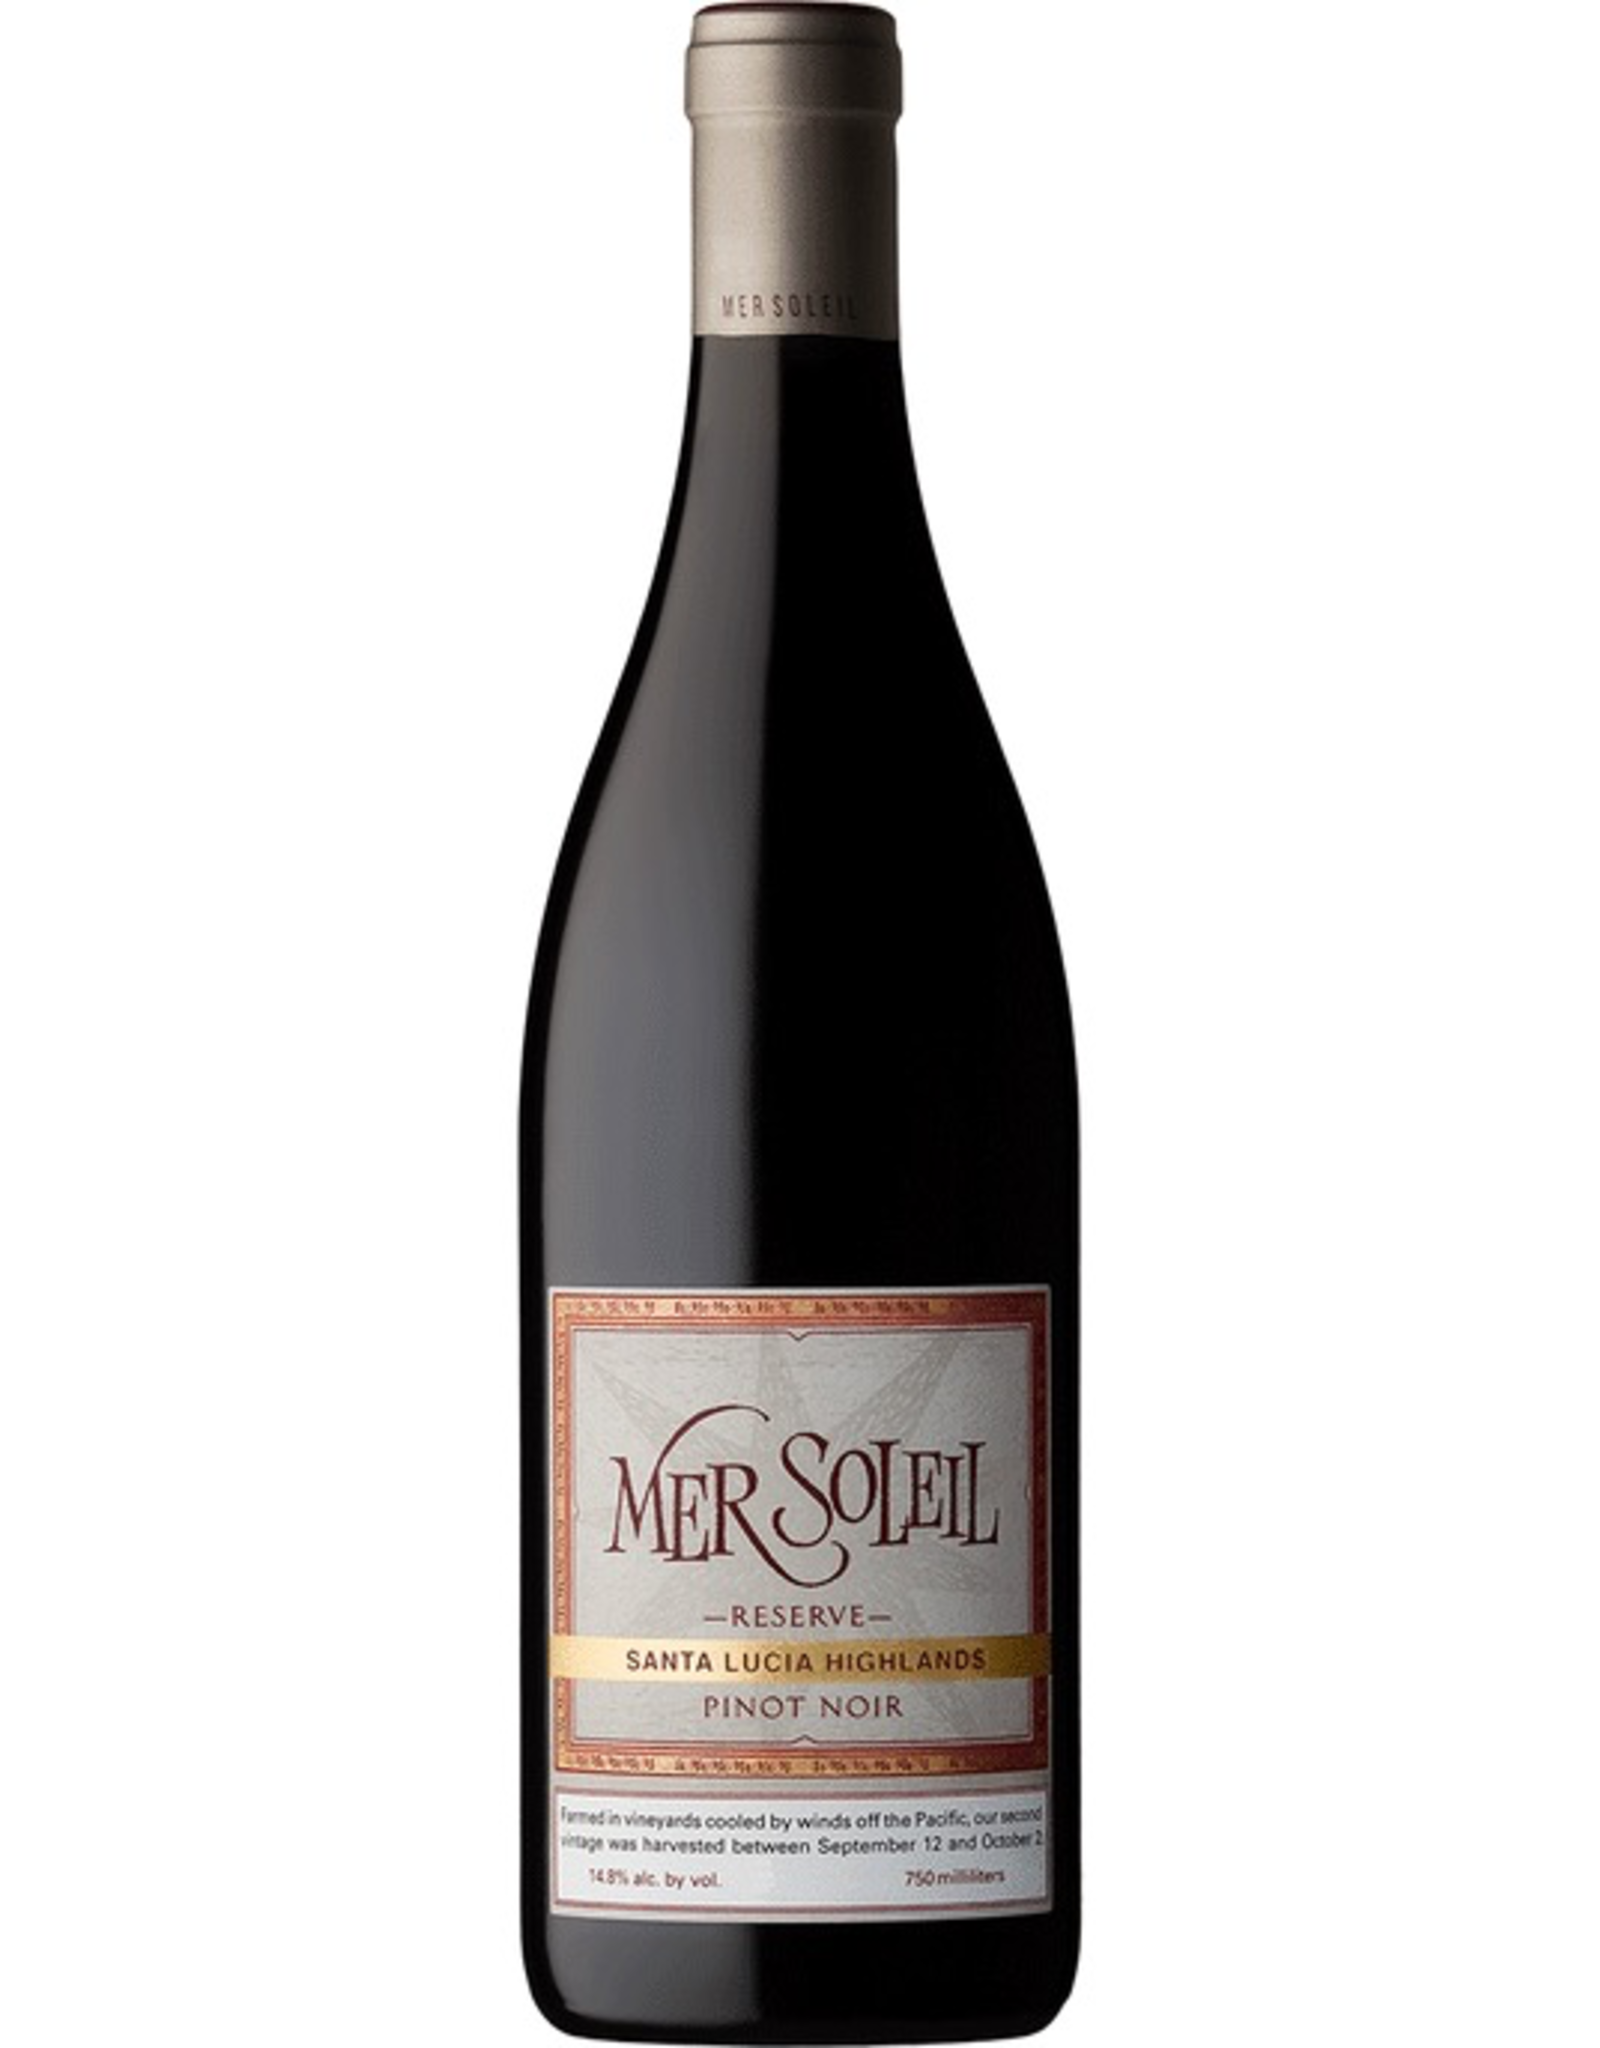 Red Wine 2018, Mer Soleil Reserve, Pinot Noir, Santa Lucia Highlands, Monterey County, California,14.8% Alc, CT90